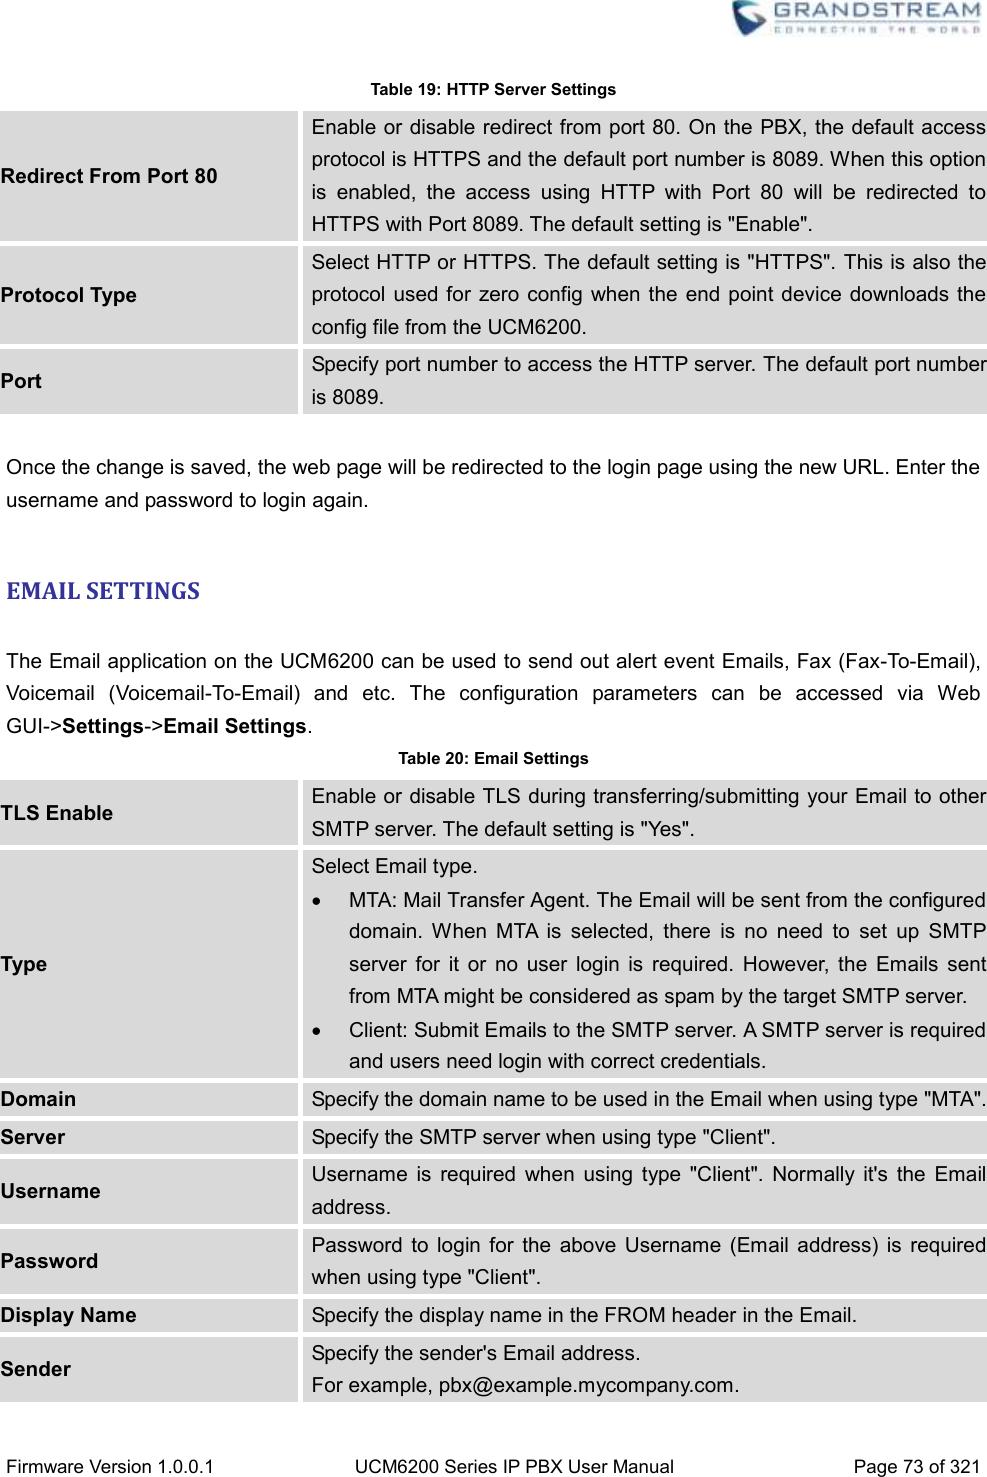 grandstream networks ucm6200 series user manual